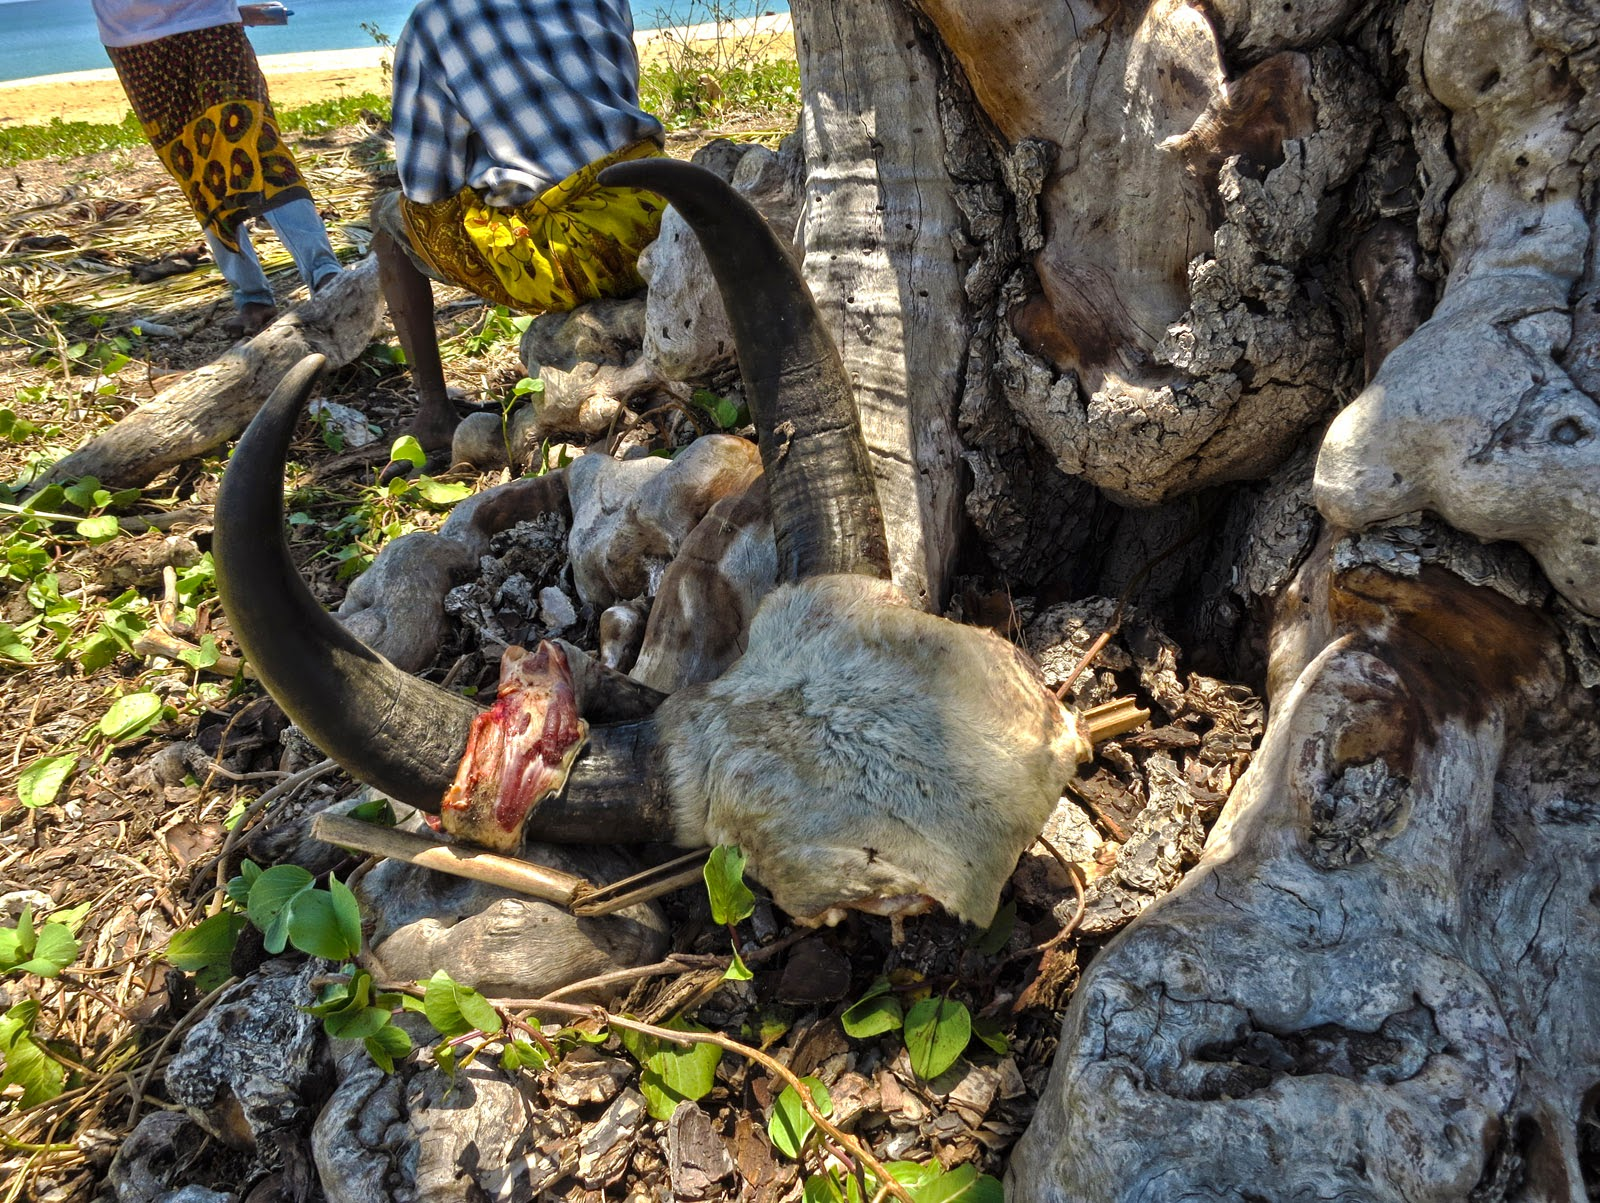 Madagascar8 - 023.jpg